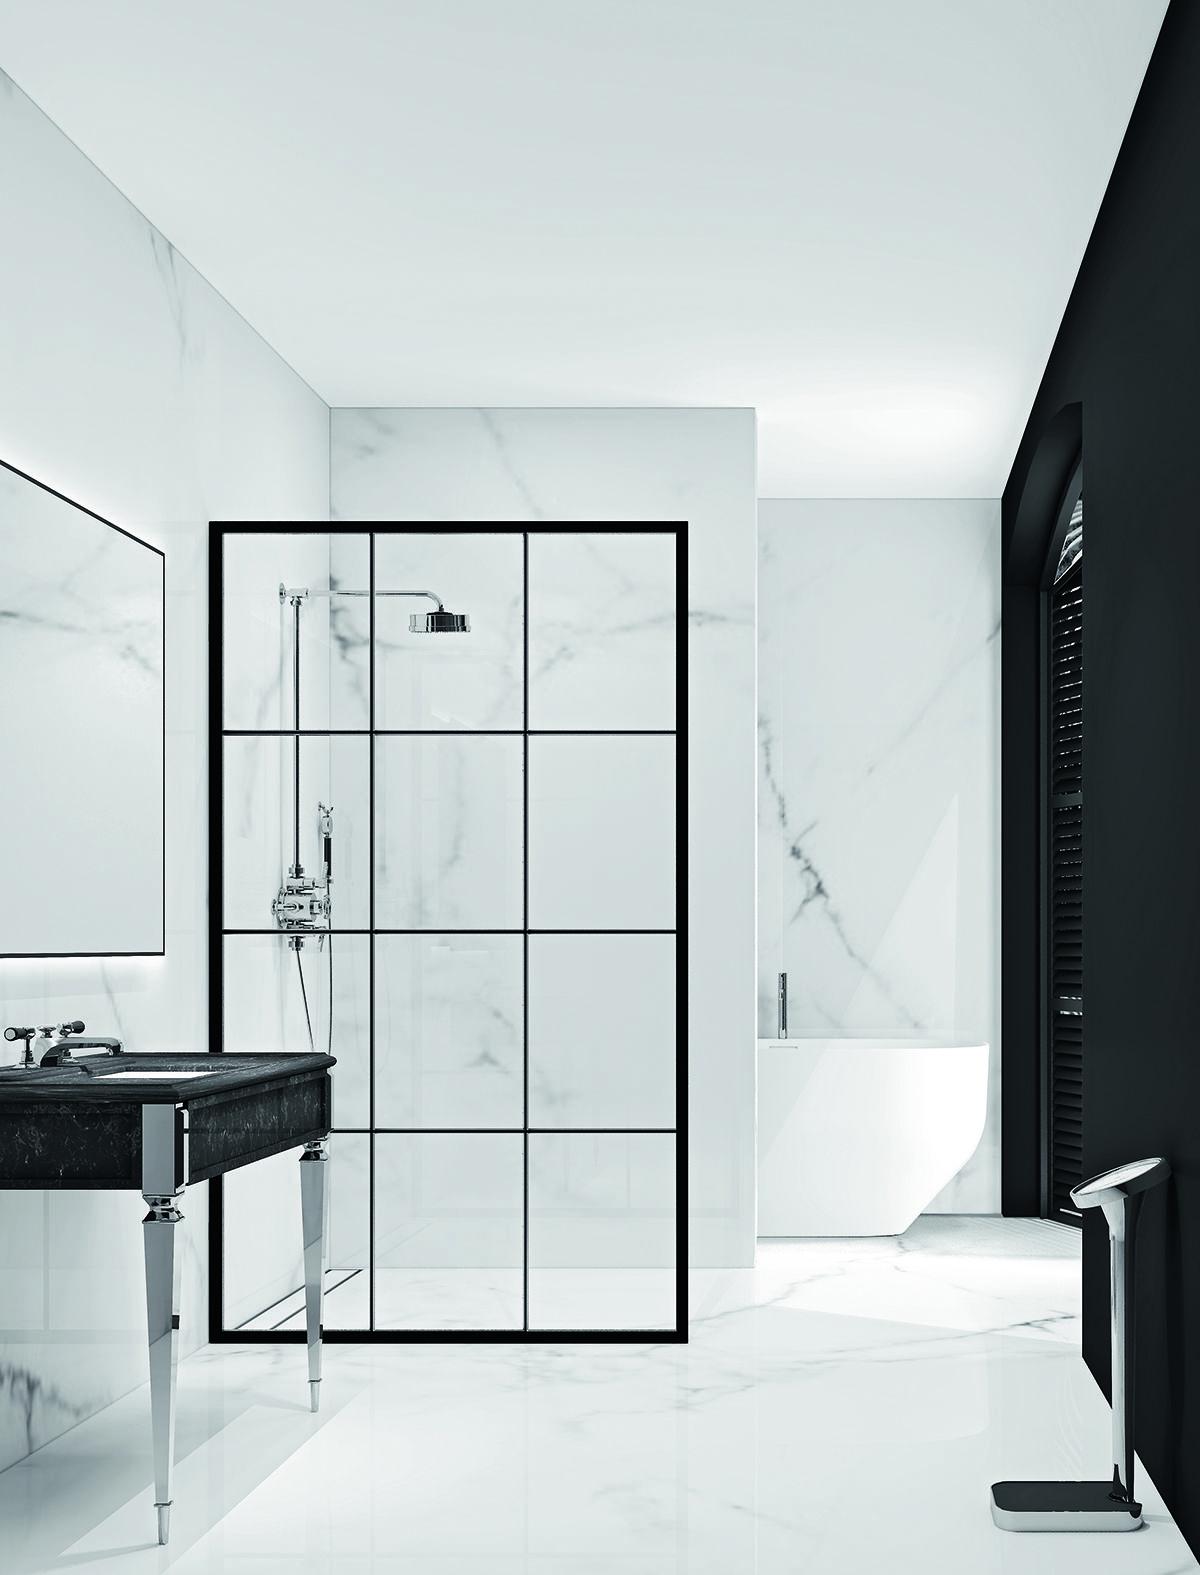 Bathroom interior hd screen time  monochrome bathrooms  pinterest